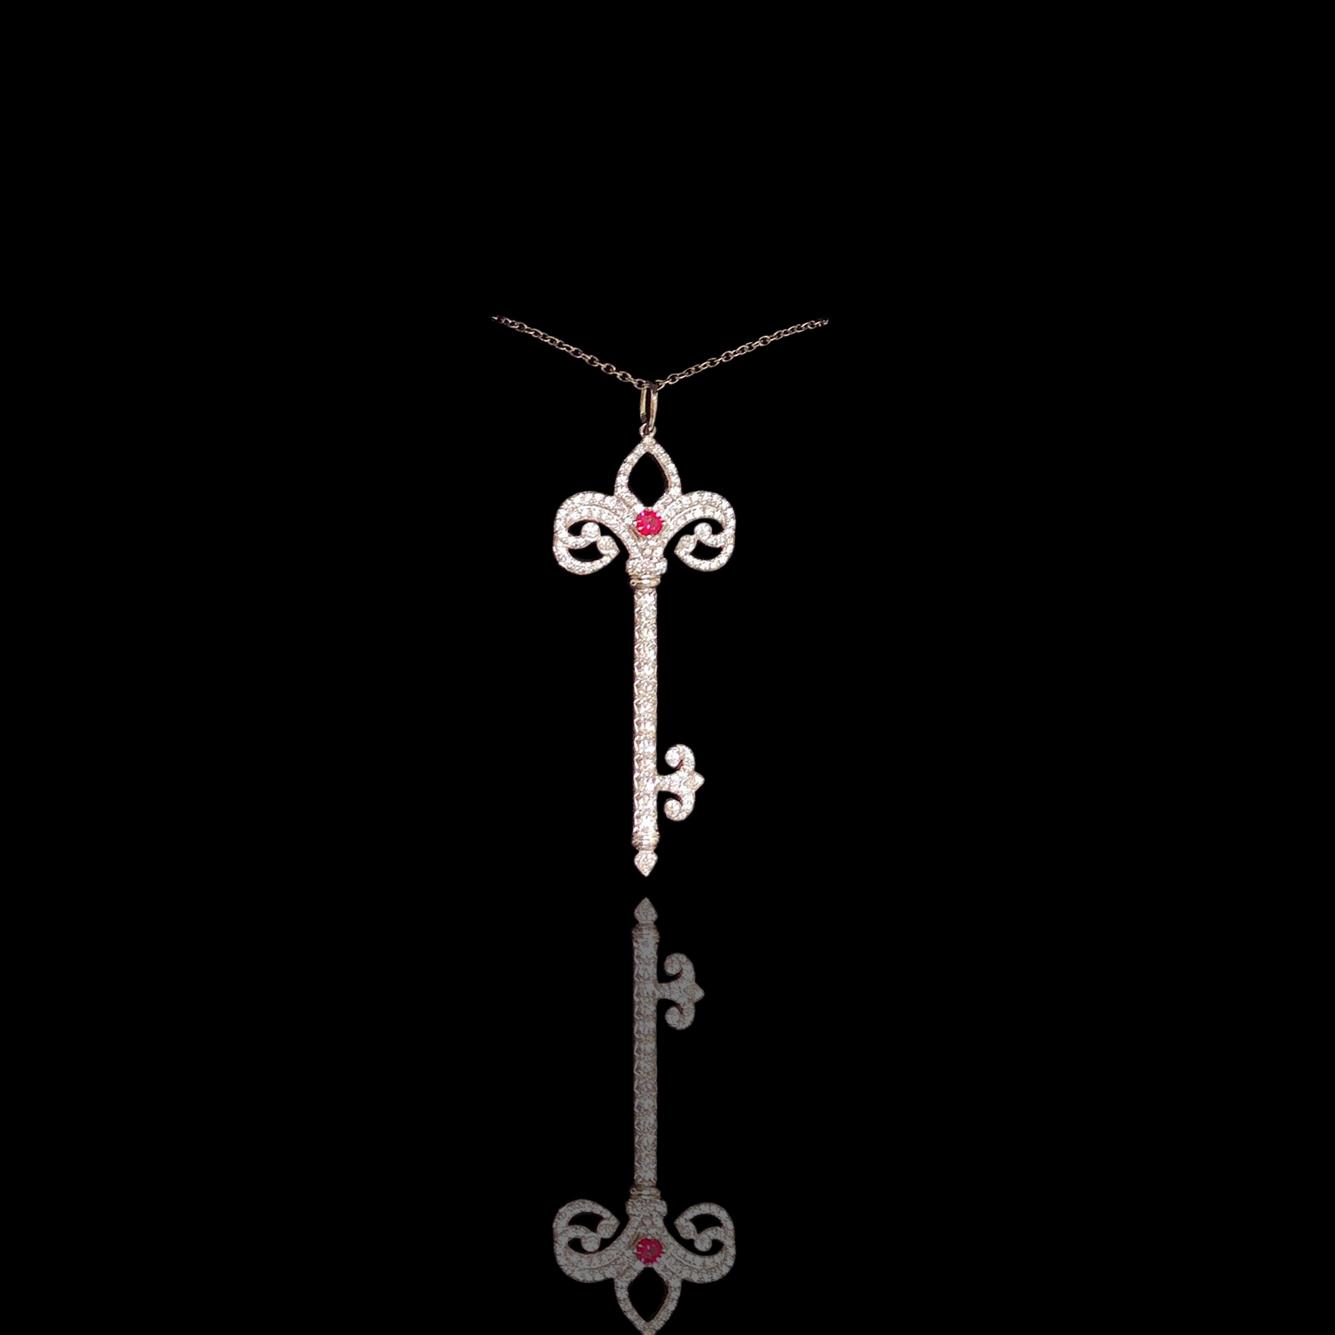 Lot 40 - Tiffany Keys Platinum, Diamonds and Ruby Necklace, Tiffany & Co.